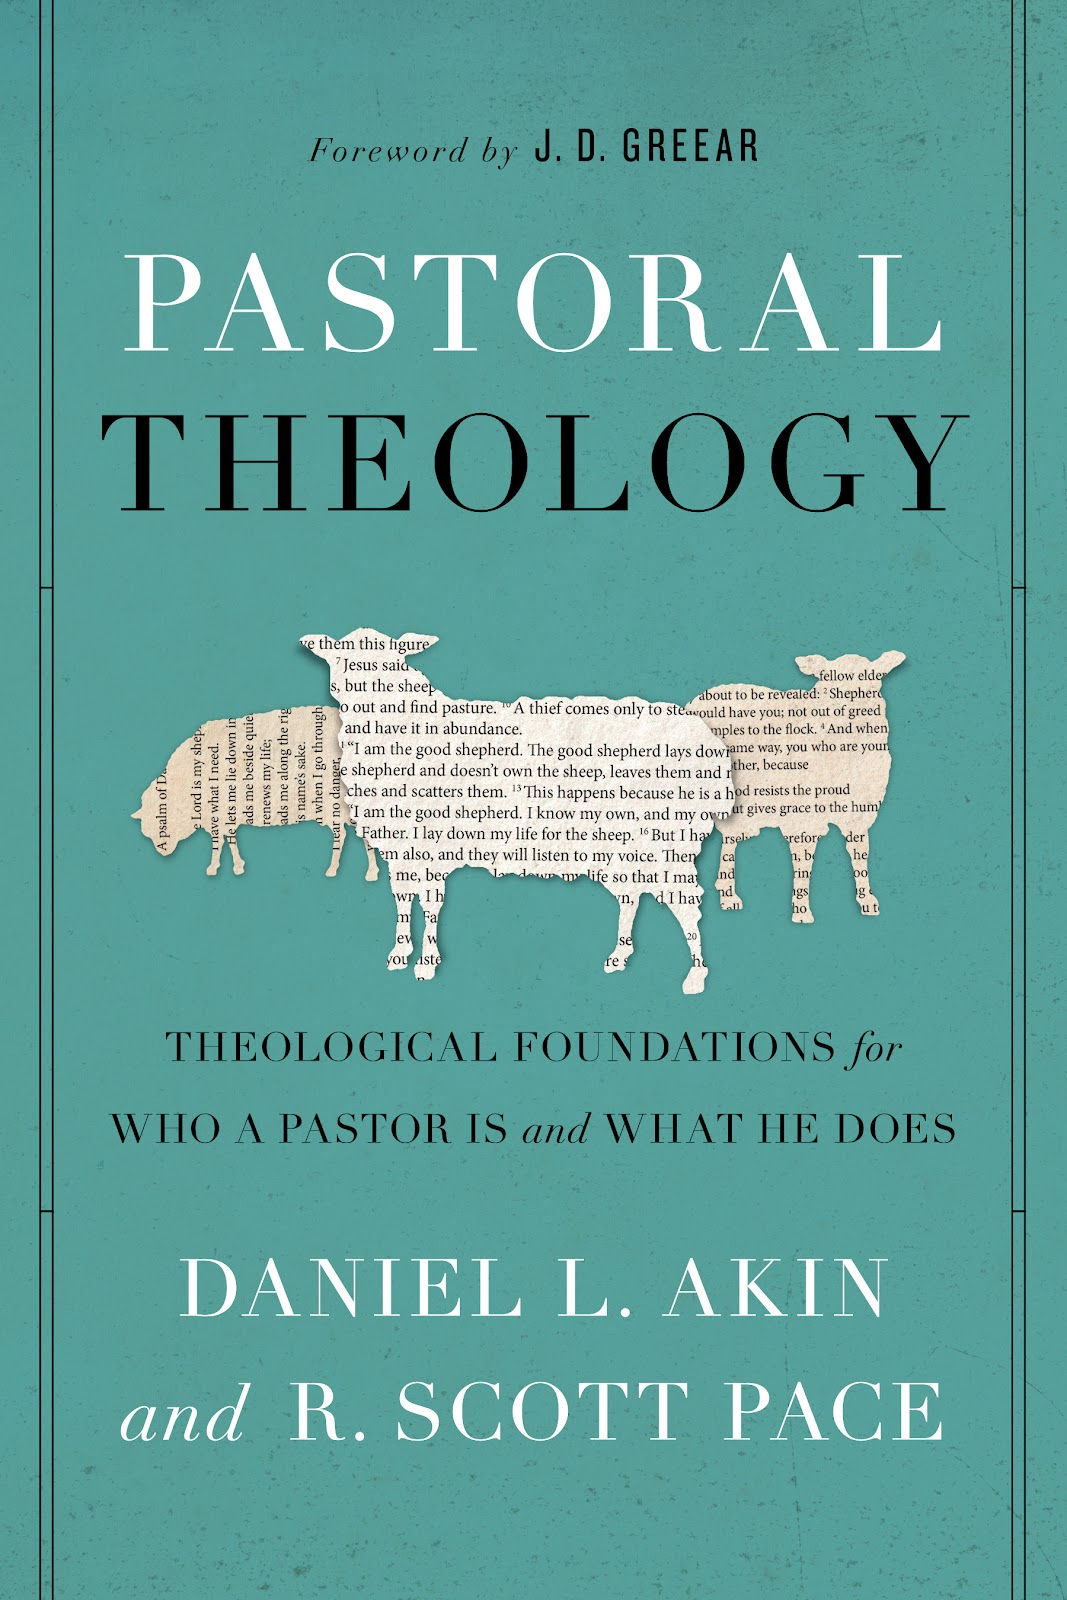 PastoralTheology_CVR.jpg